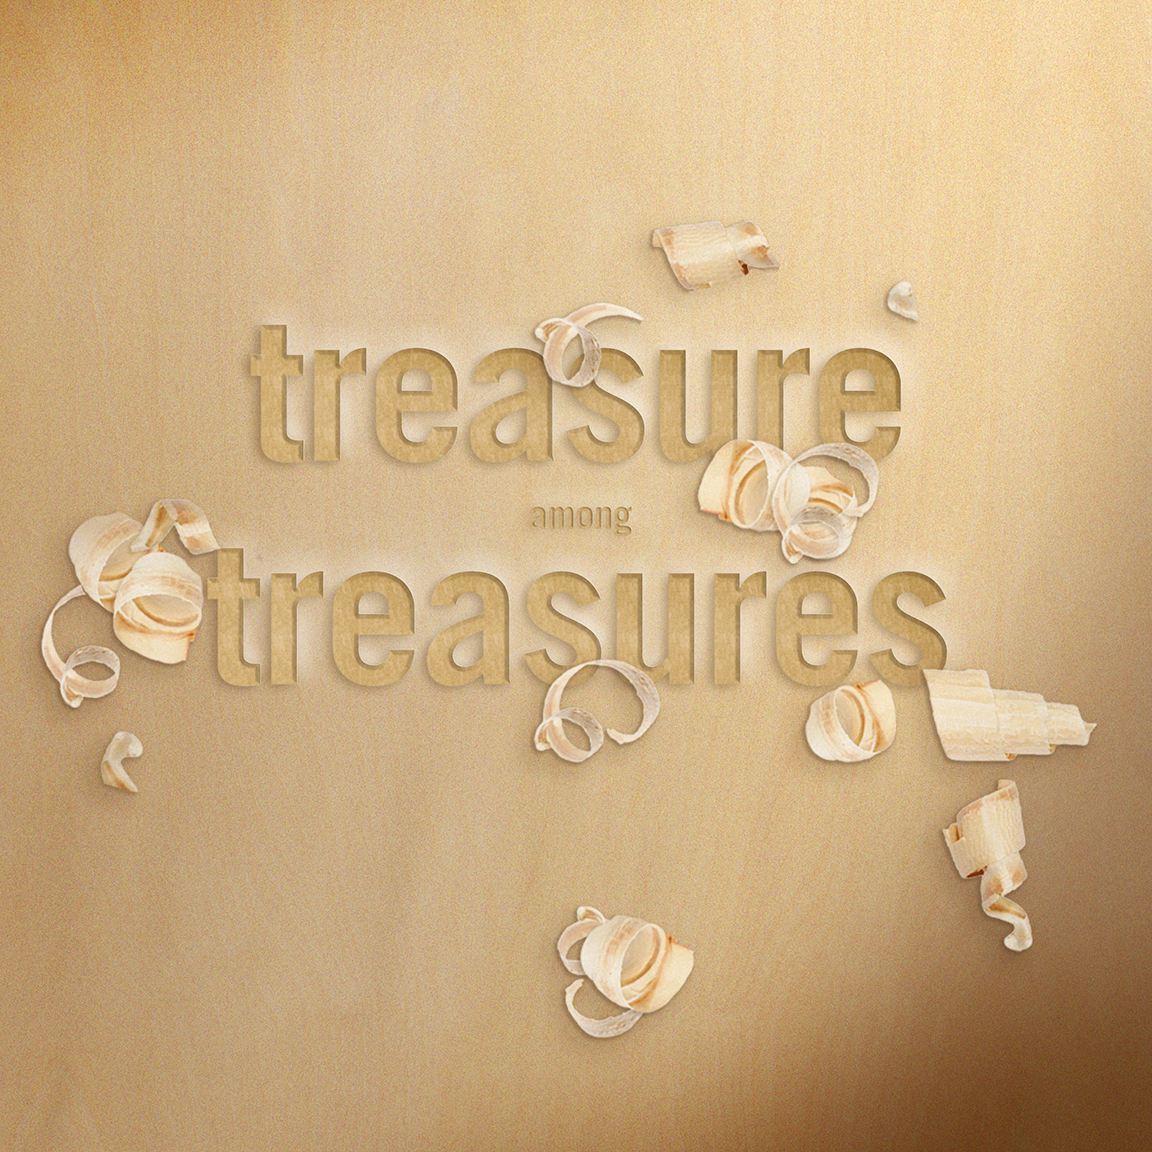 Treasure_96dpi.jpg